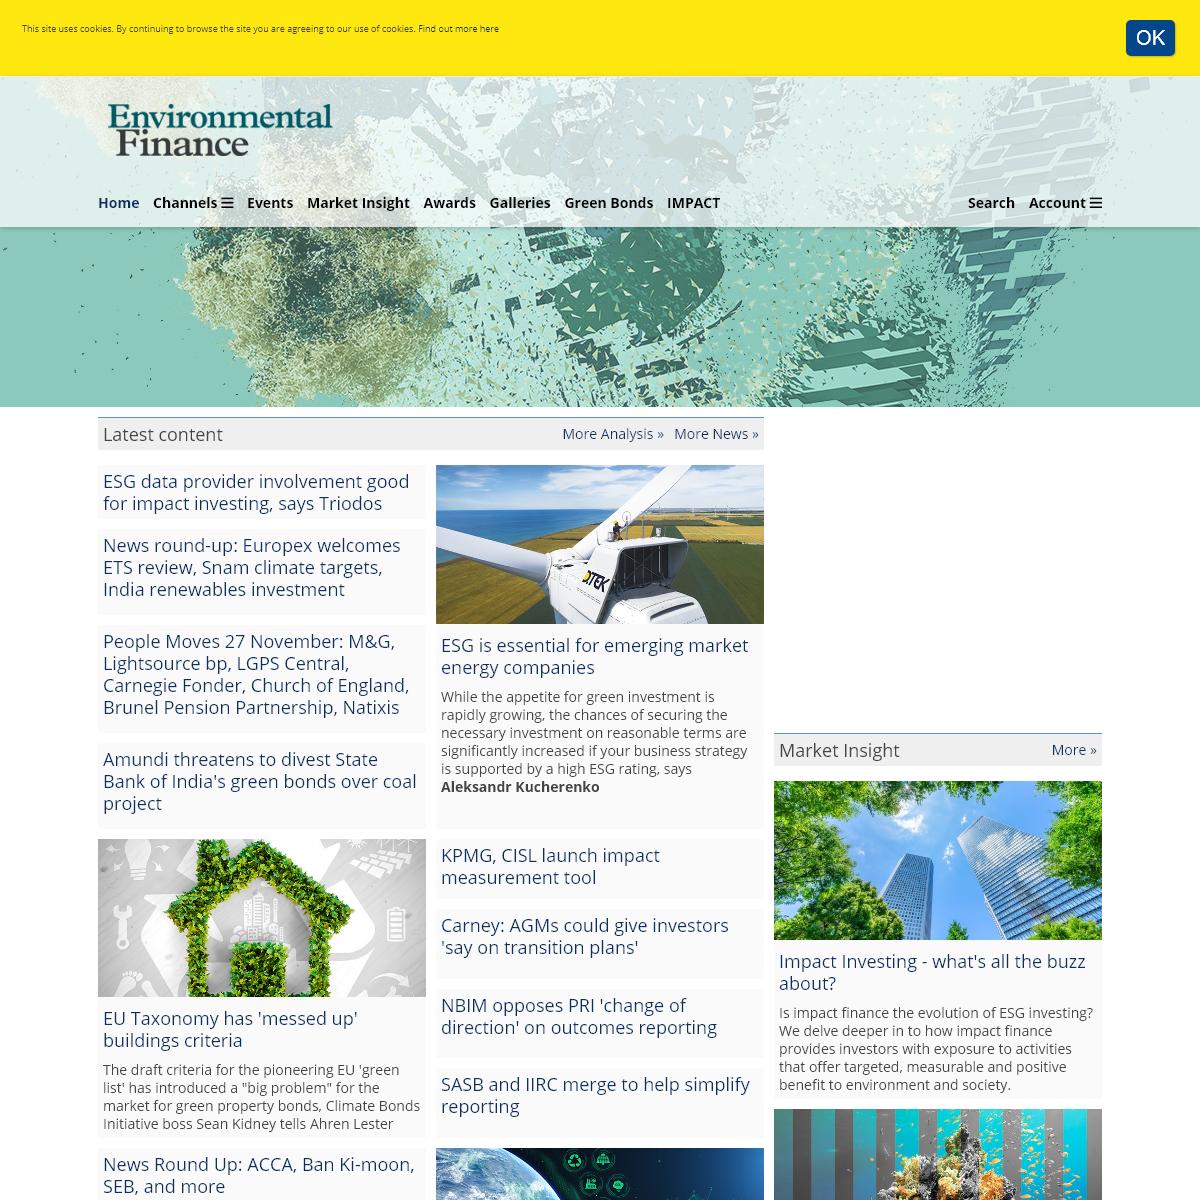 Home - Environmental Finance